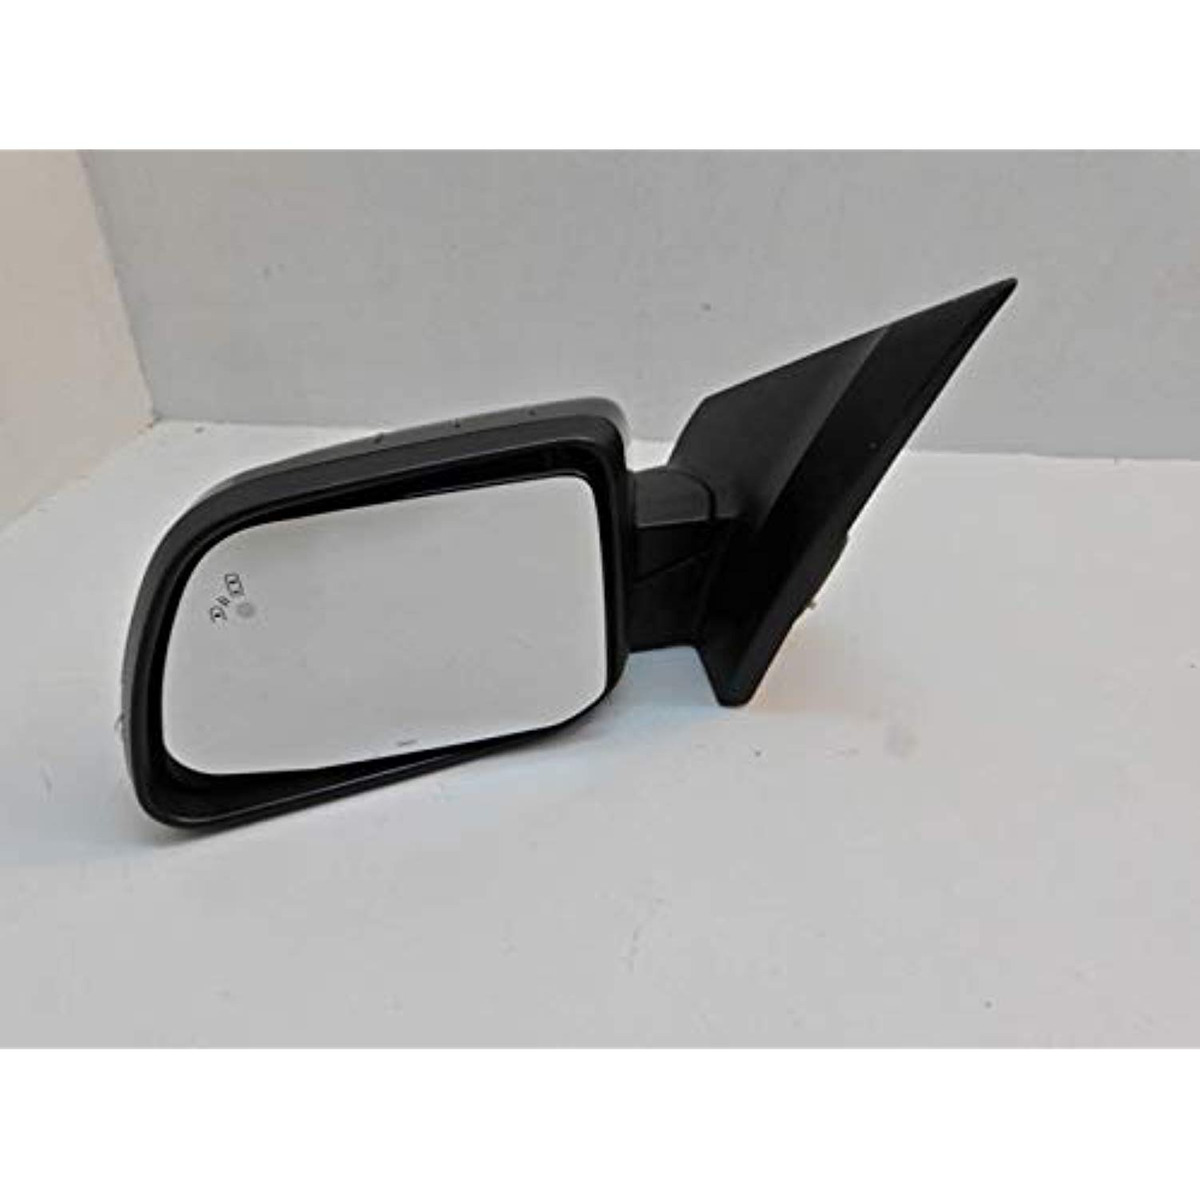 Genuine Ford Power Mirror CT4Z-17683-DAPTM